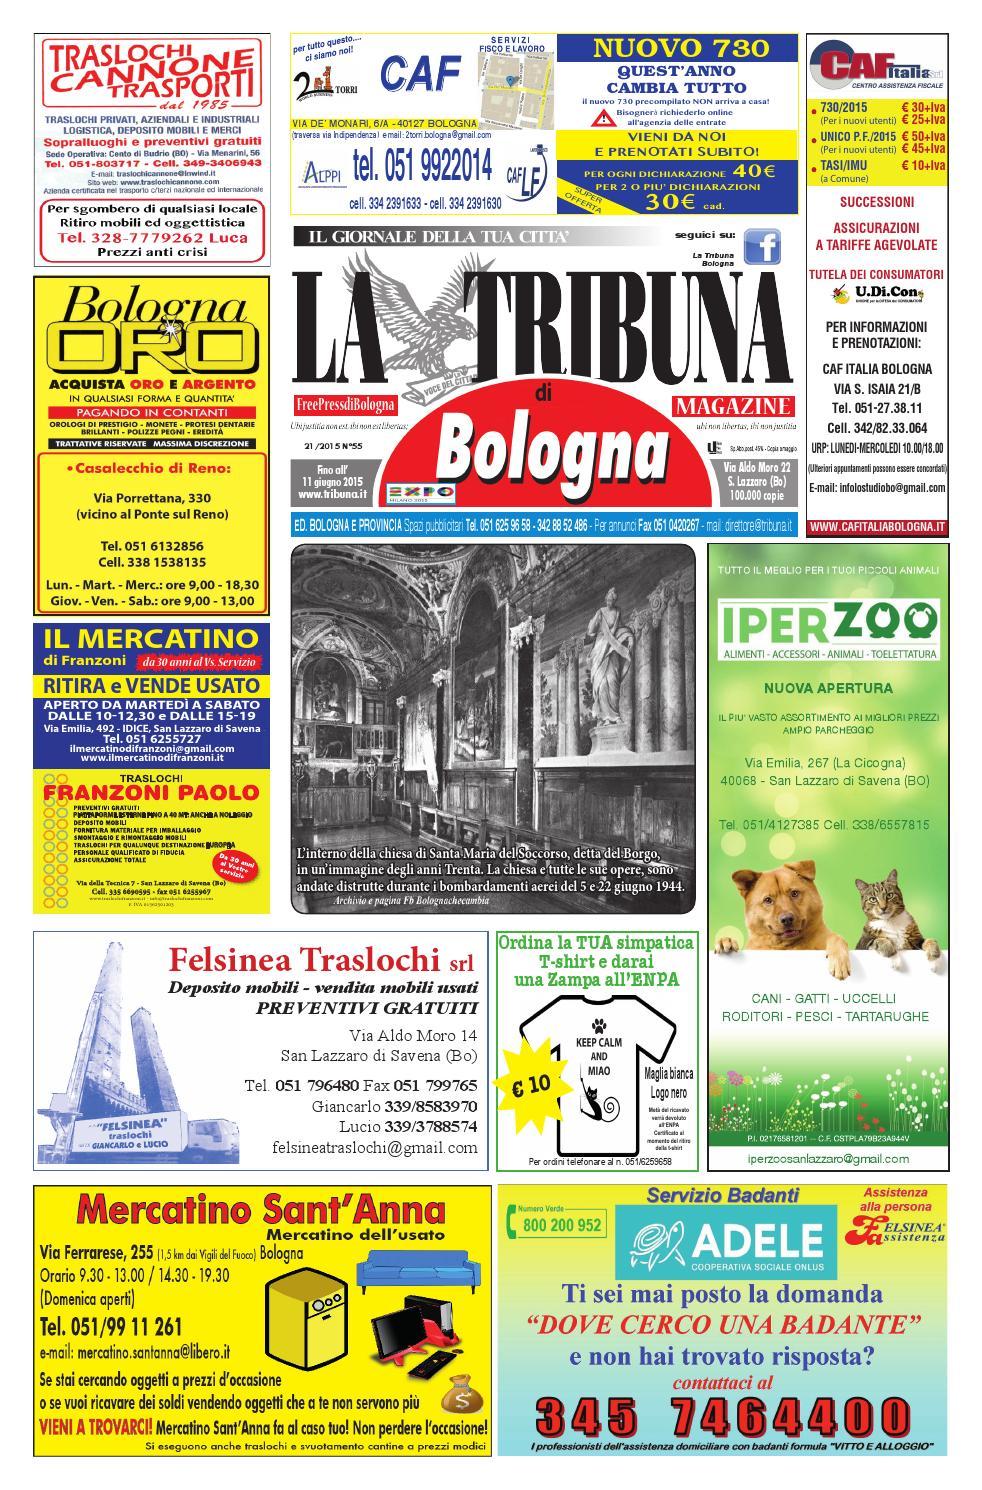 Tribuna n. 55 by La Tribuna srls - Issuu